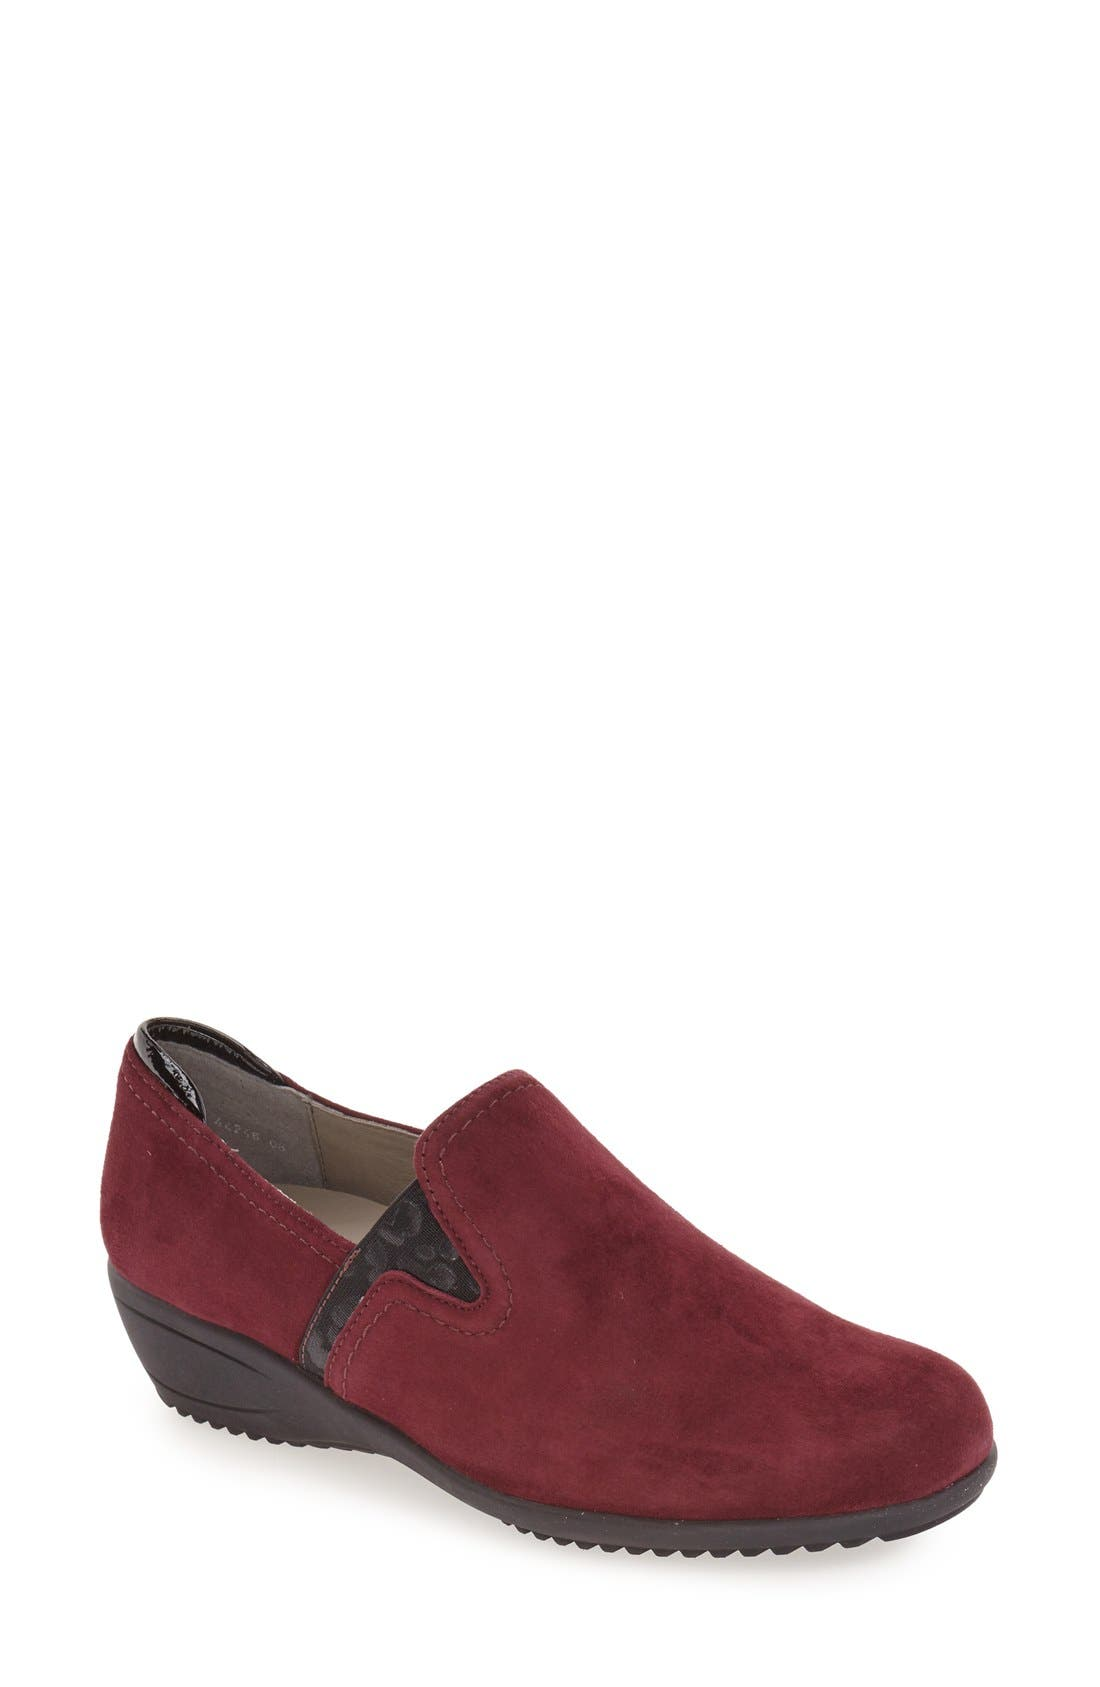 'Lilli' Wedge Loafer,                         Main,                         color, Burgundy Suede